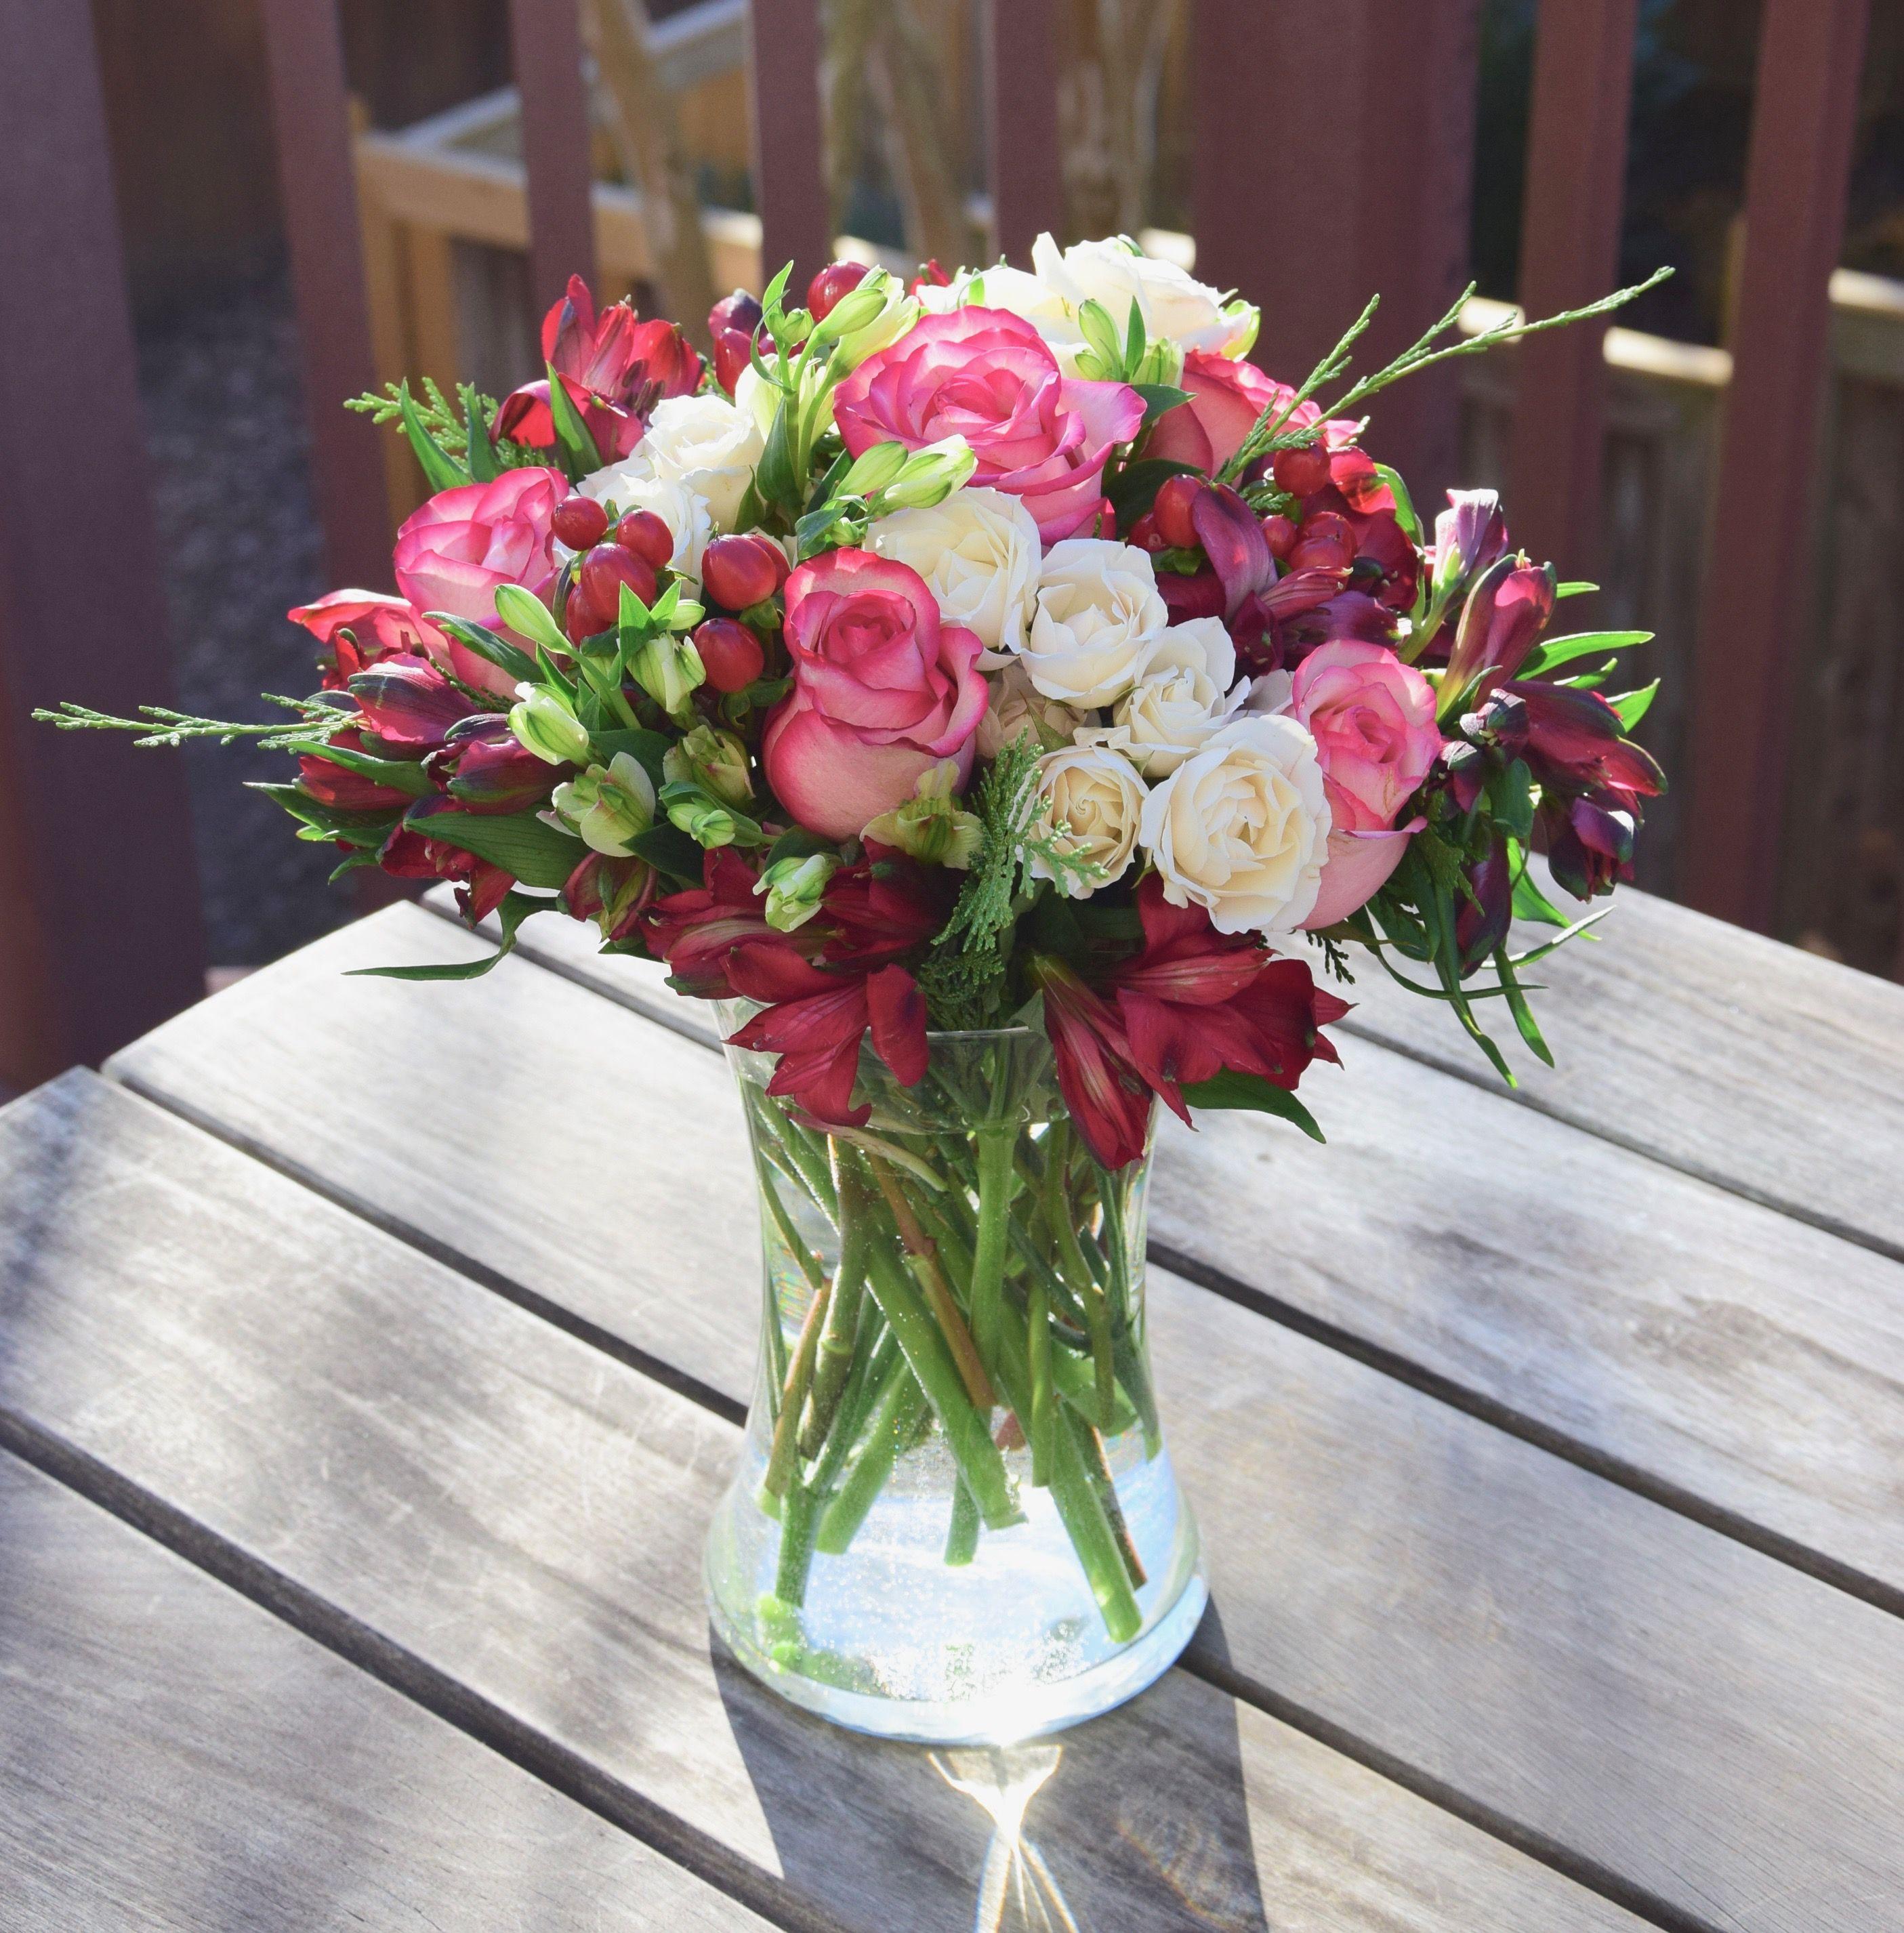 Fresh Flowers In A Vase Alstroemeria Roses Spray Roses And Hypericum Berry Fresh Flowers Arrangements Flower Arrangements Rose Arrangements